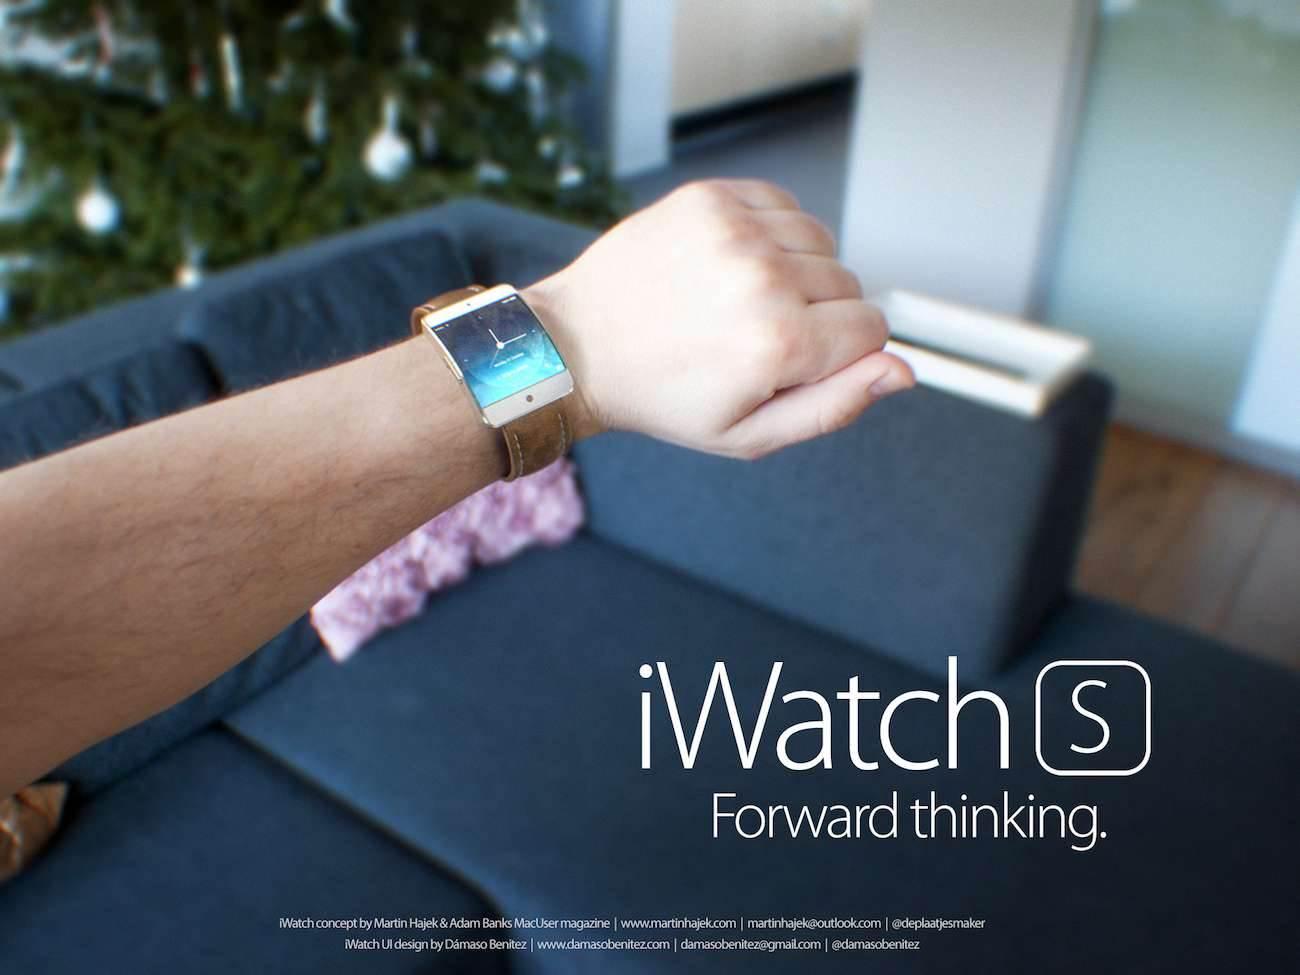 iwatchC-on-wrist